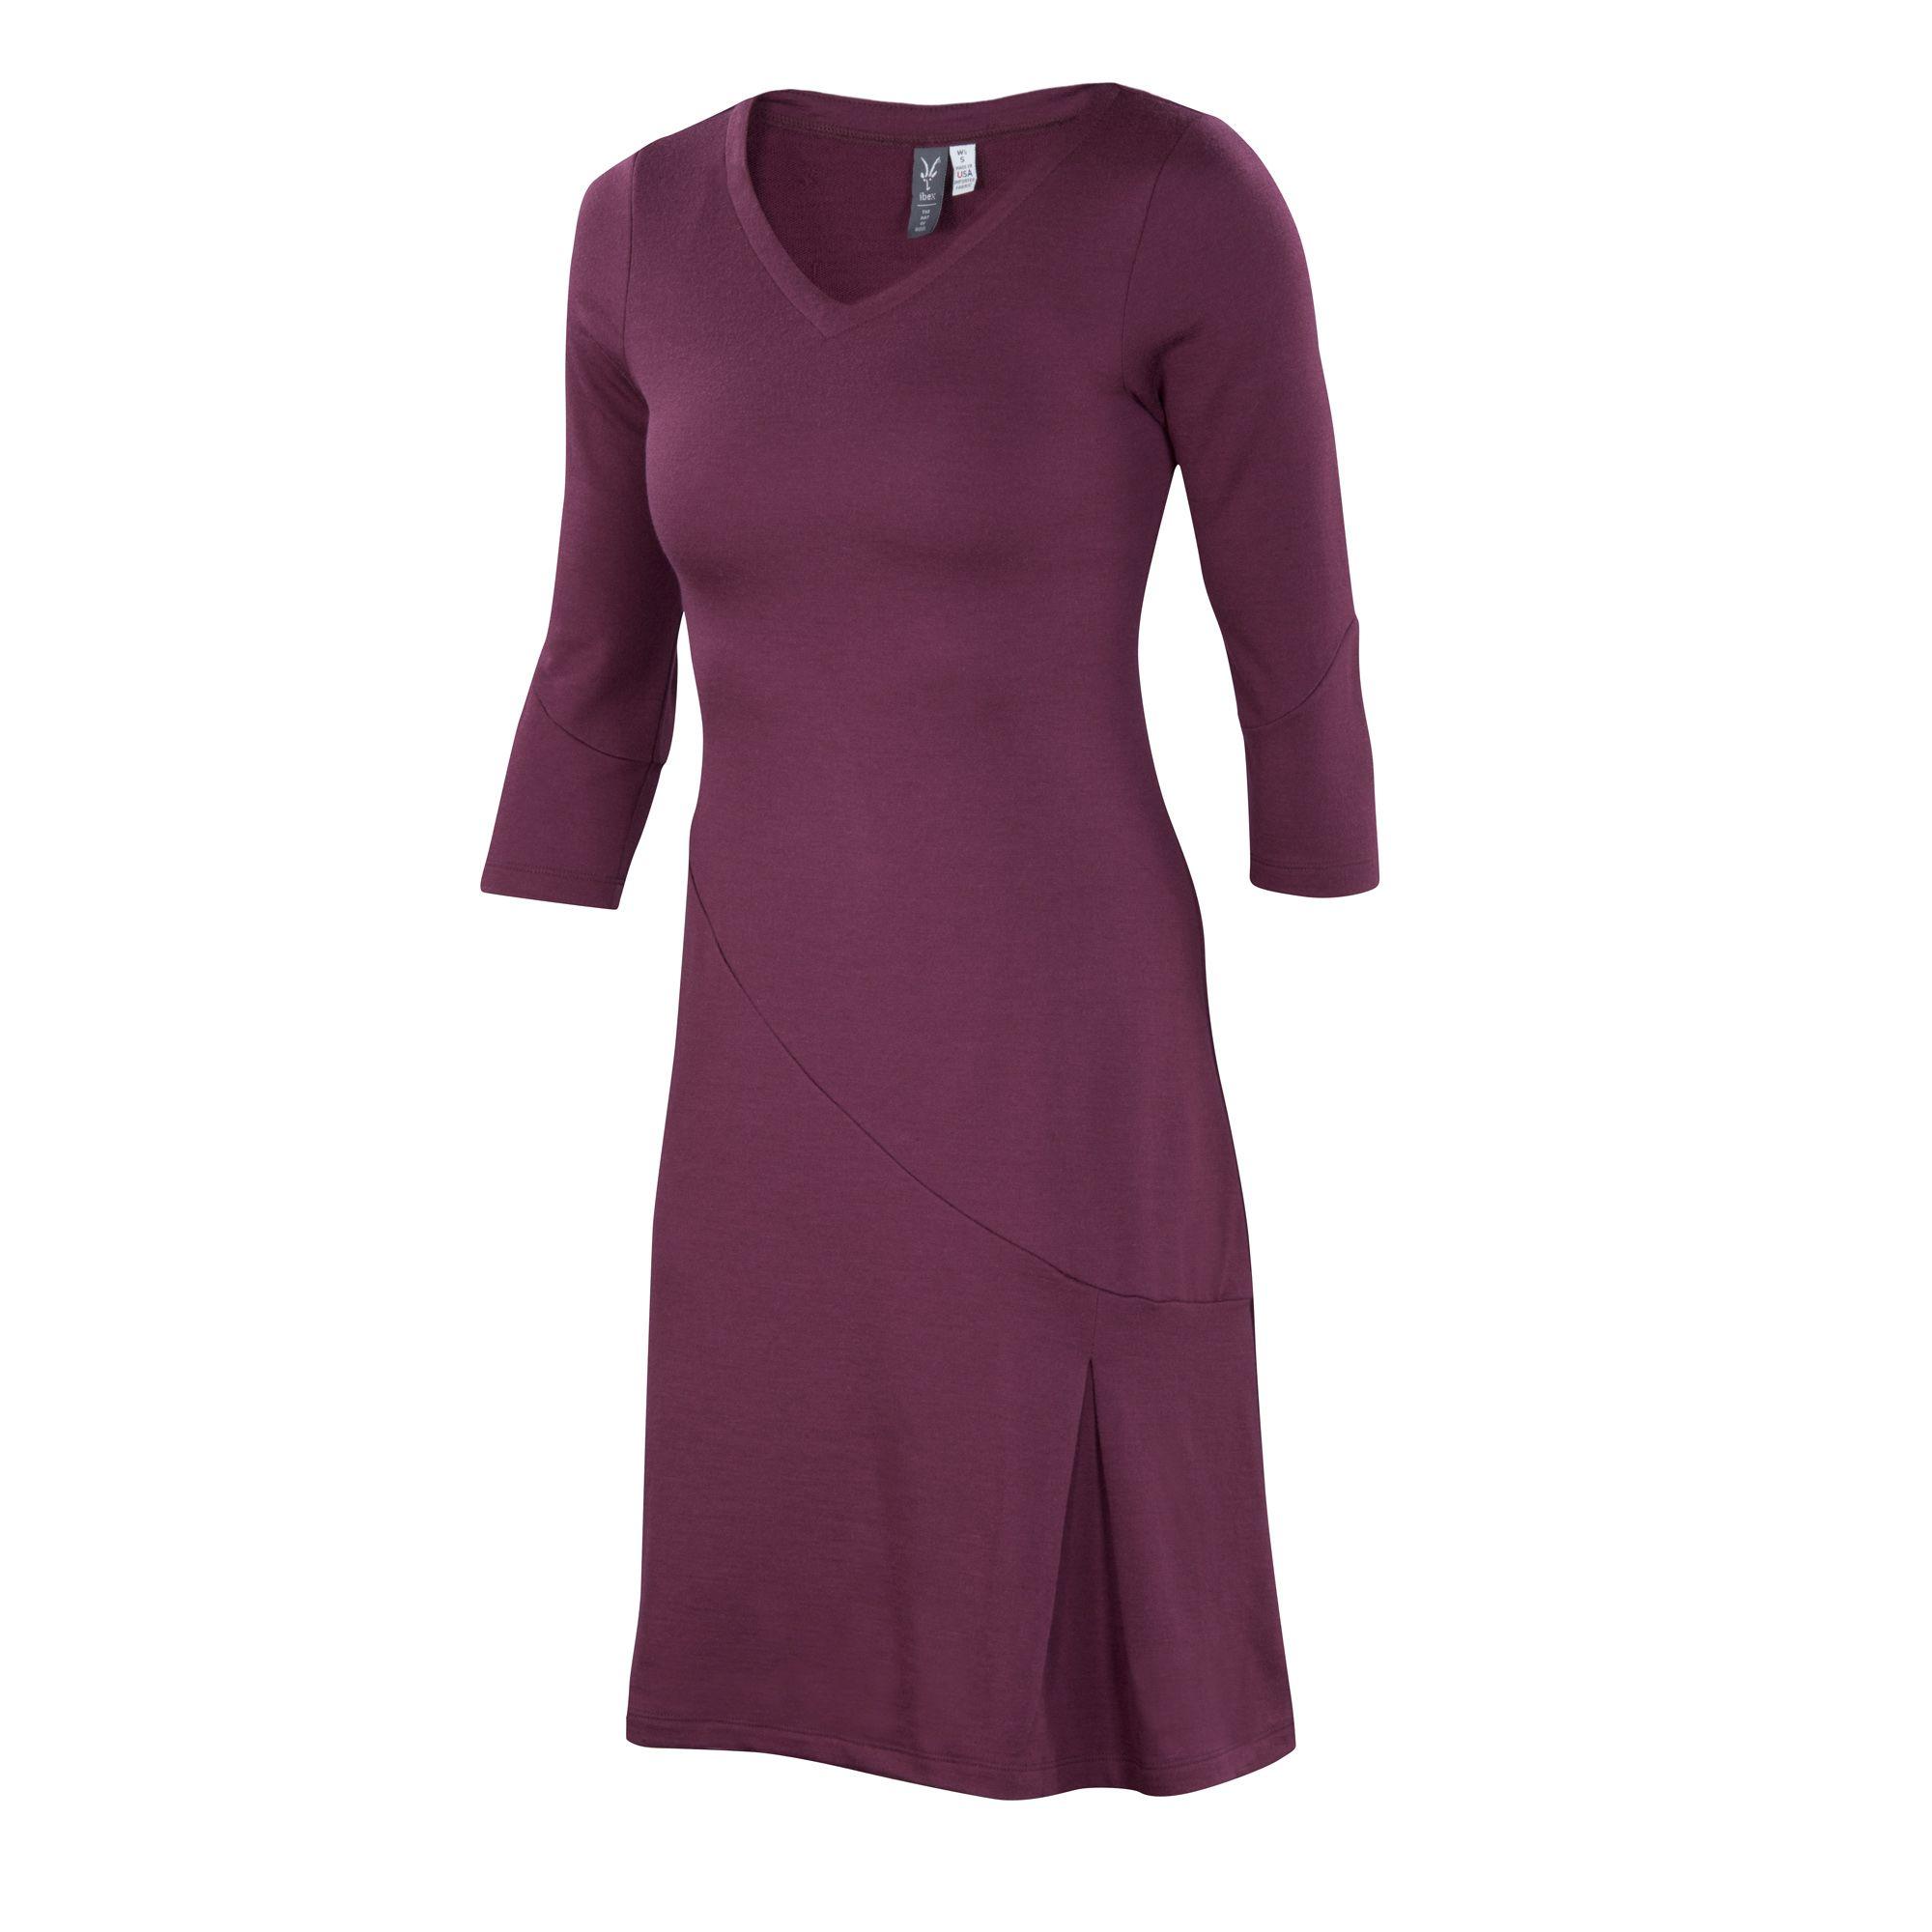 Mid-weight Merino French terry dress